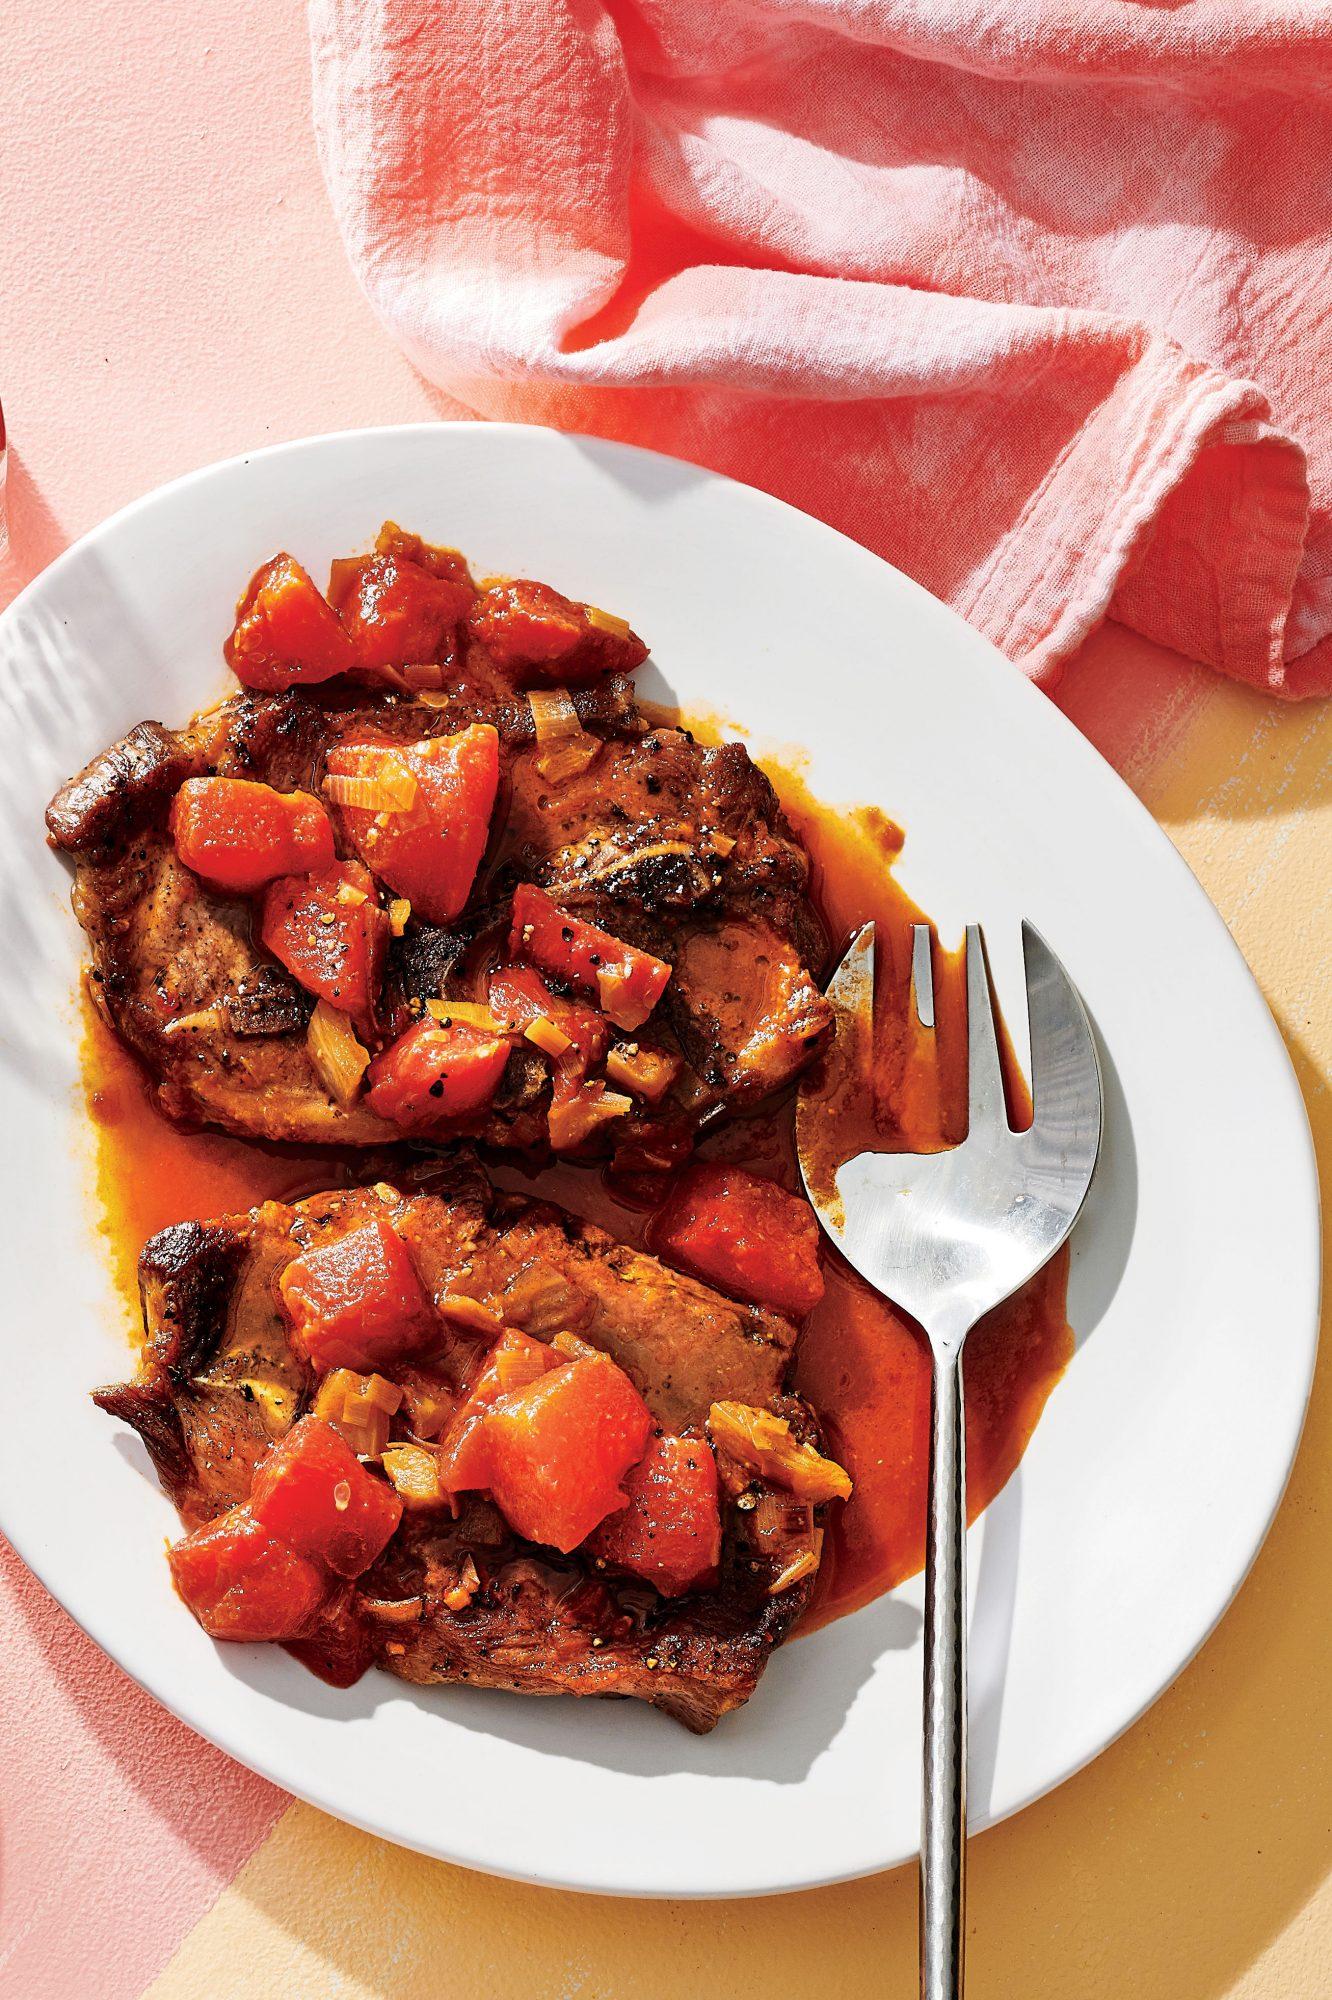 Watermelon-Braised Pork Shoulder Steaks